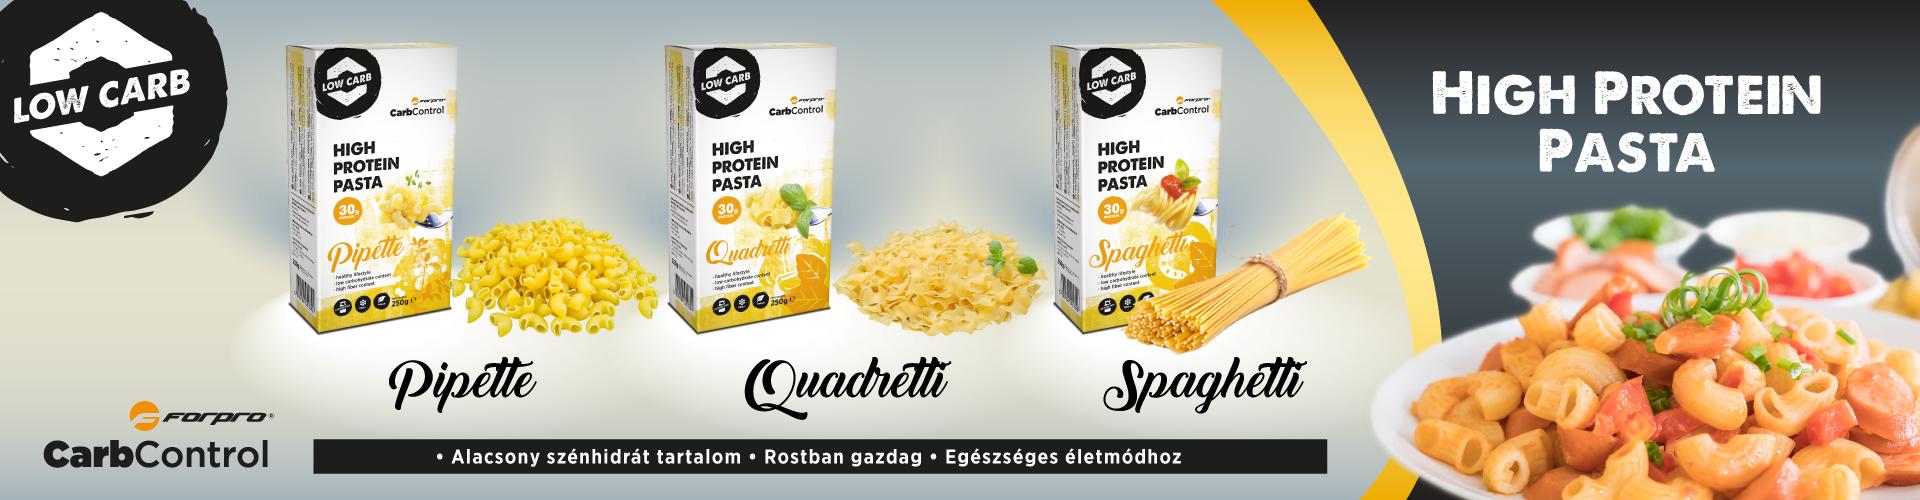 ForPro High Protein Pasta protein tészták